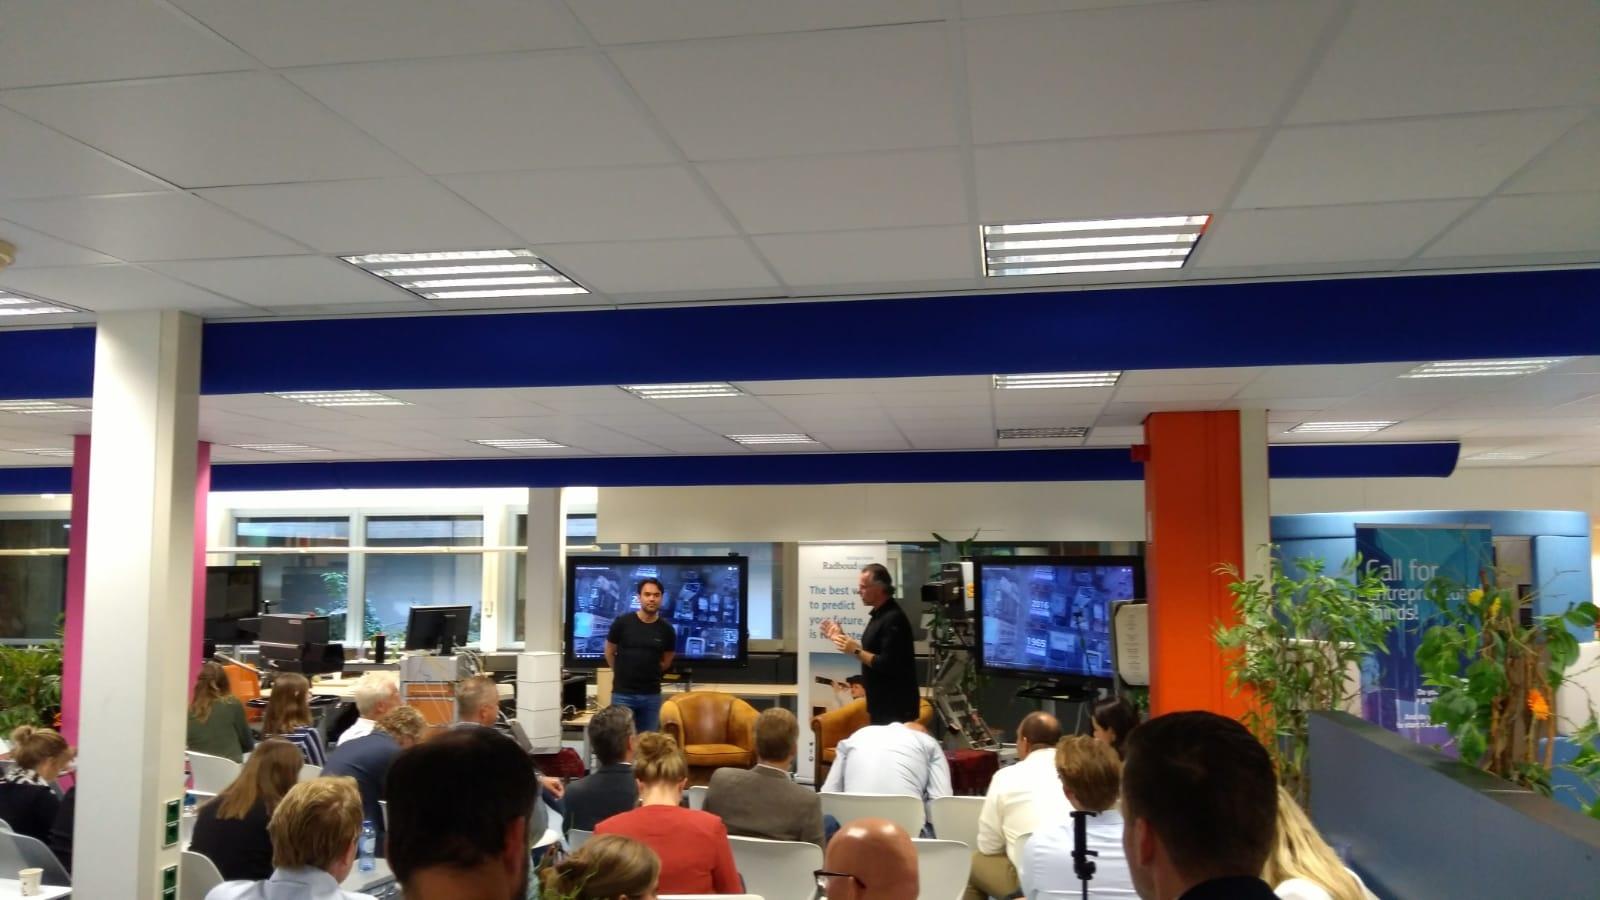 Lucien Engelen organized a health Tech update for Delloite at REshape RADBOUDUMC.